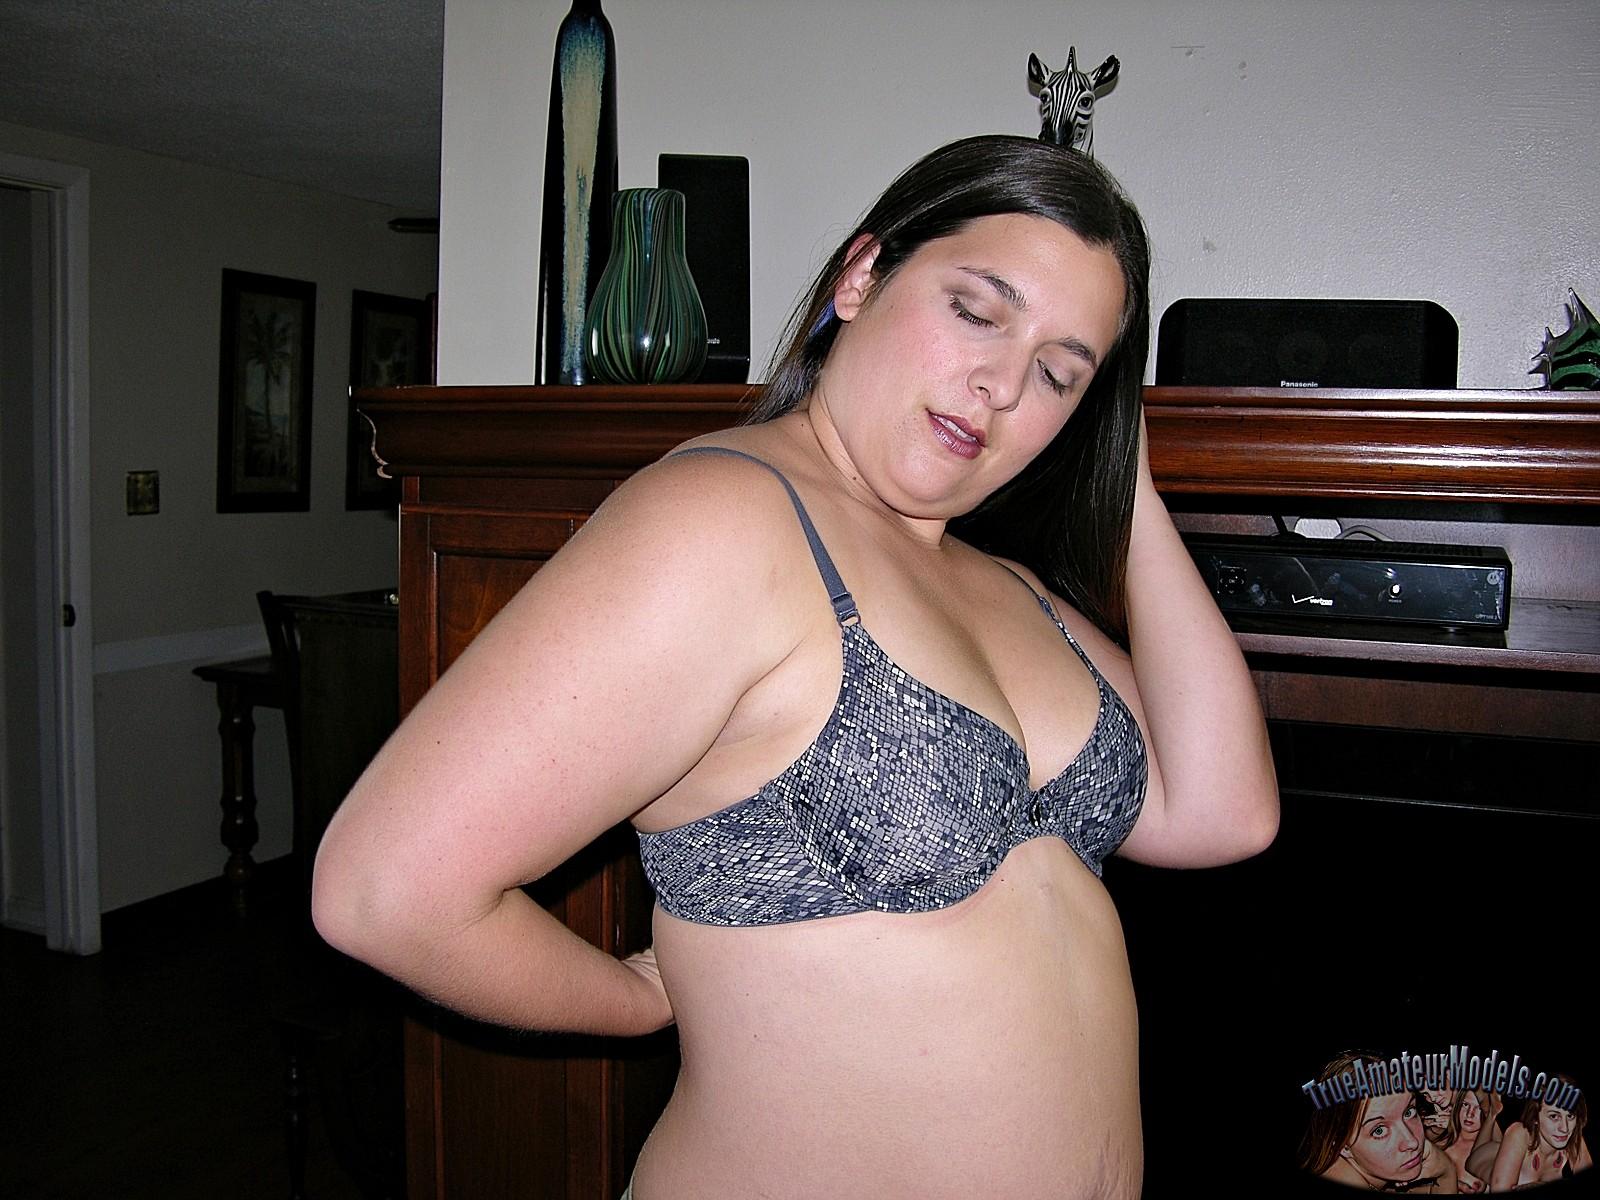 trueamateurmodels promo phoenix 01 chubby stripping